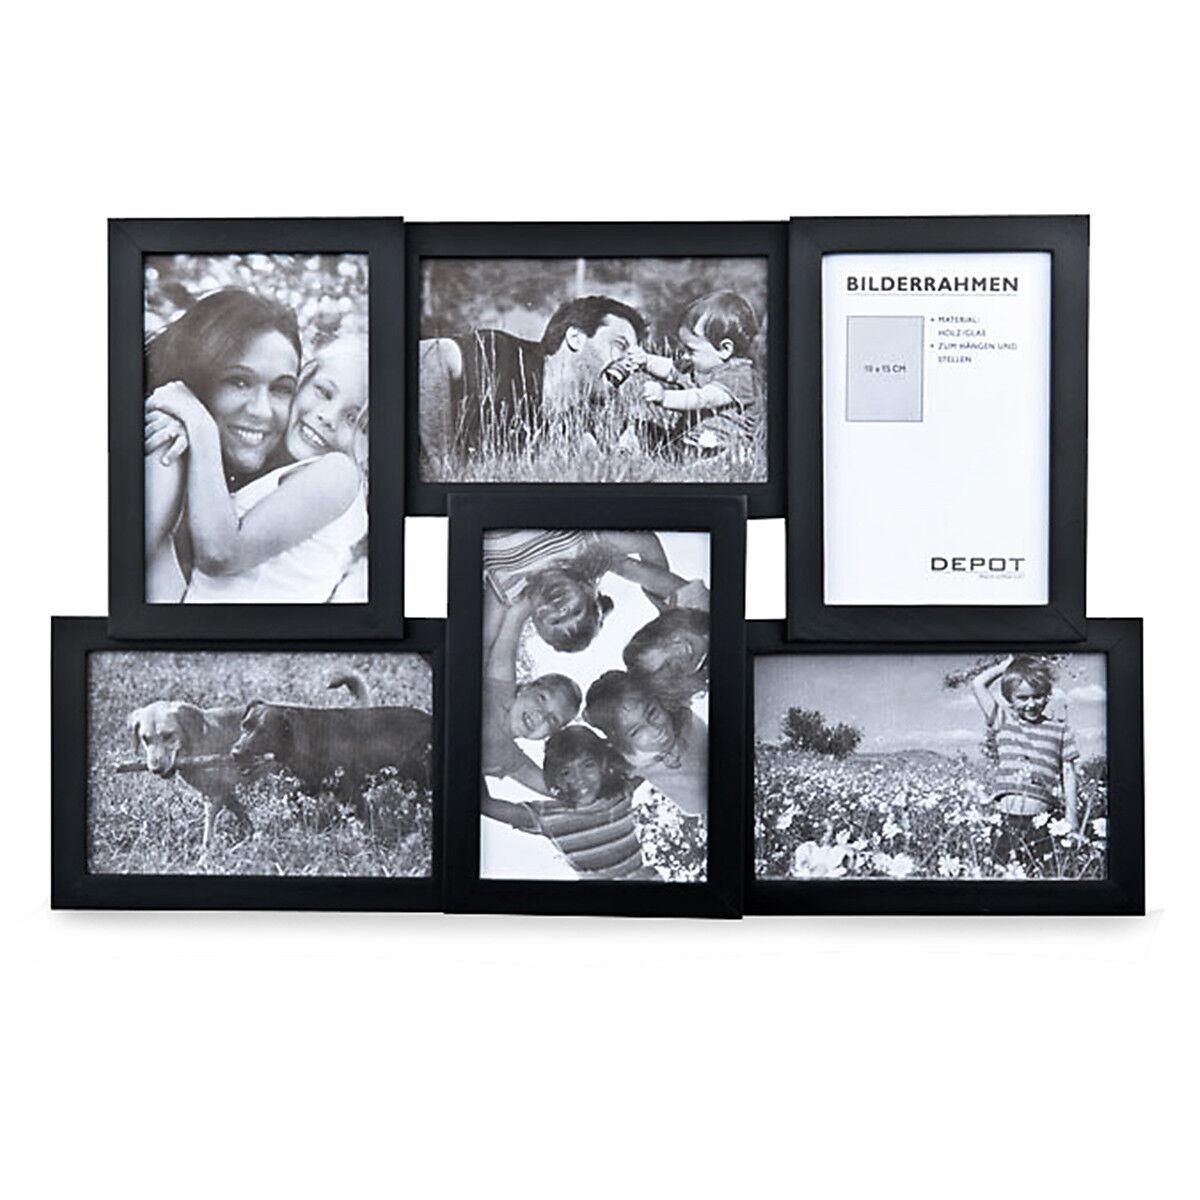 bilderrahmen collage holz schwarz ca l 45 x b 29 x h 3 cm. Black Bedroom Furniture Sets. Home Design Ideas